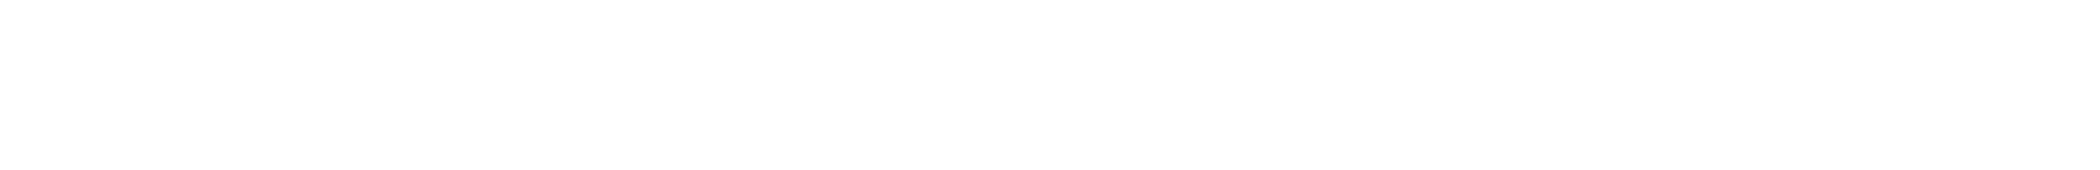 https://sodiac.de/wp-content/uploads/2020/04/white_divider_top_weiche_kante.png